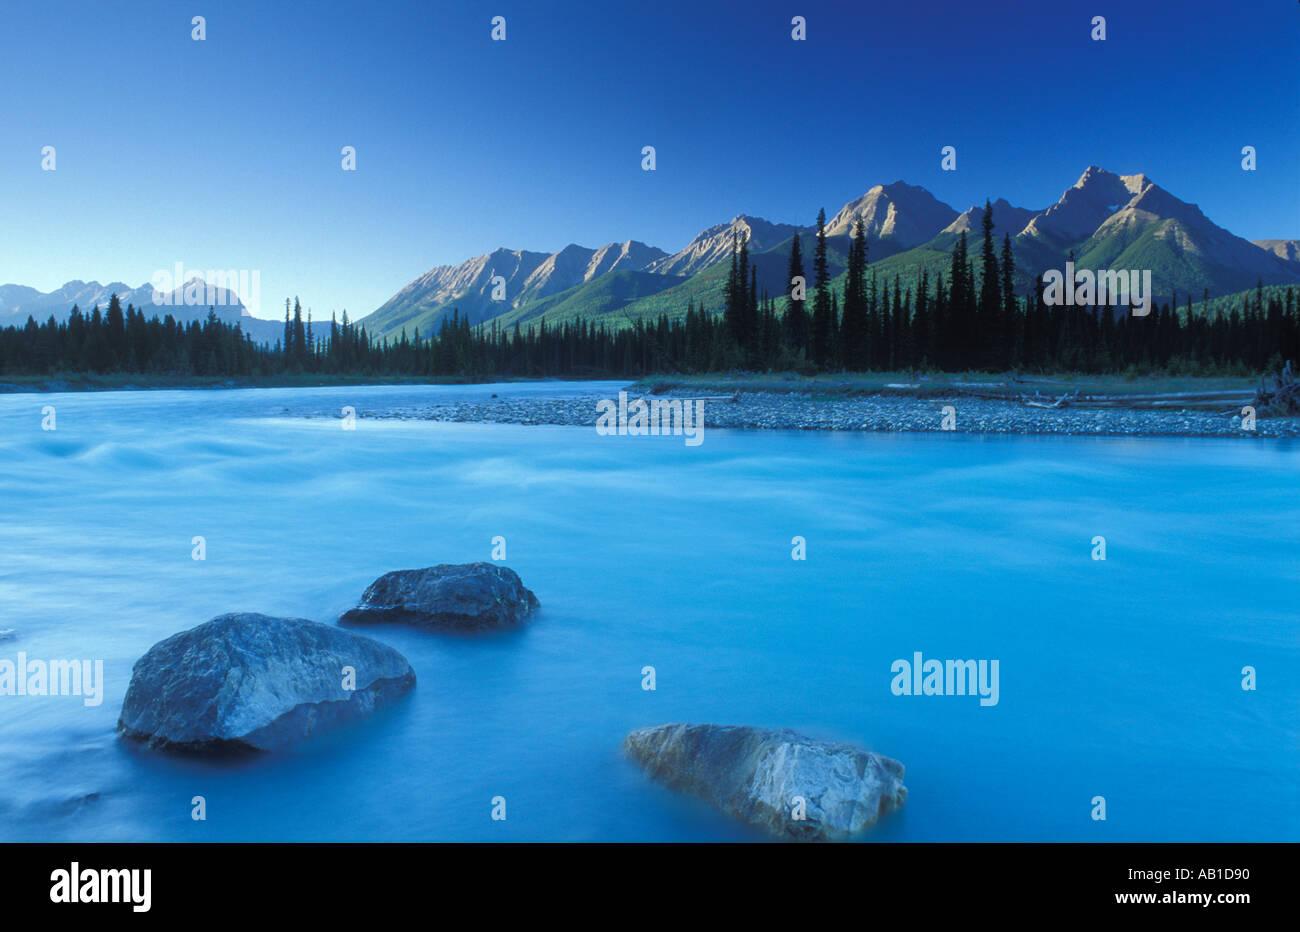 Kootenay River Kootenay National Park British Columbia Canada - Stock Image